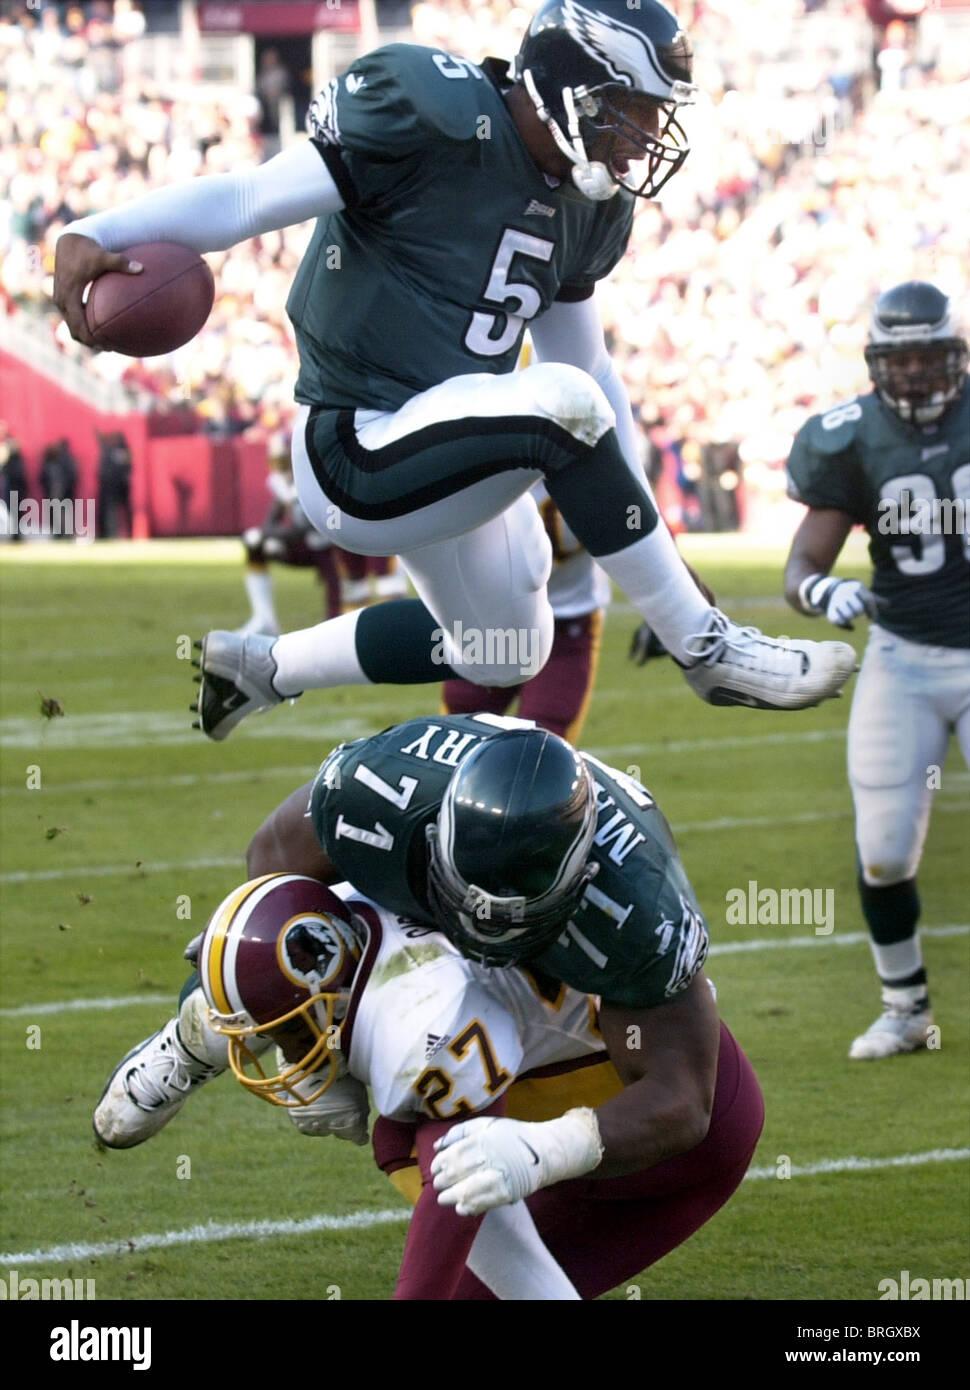 f51aaafa001 Philadelphia Eagles' Donovan McNabb (5) jumps over Eagles' Jermane Mayberry  (71